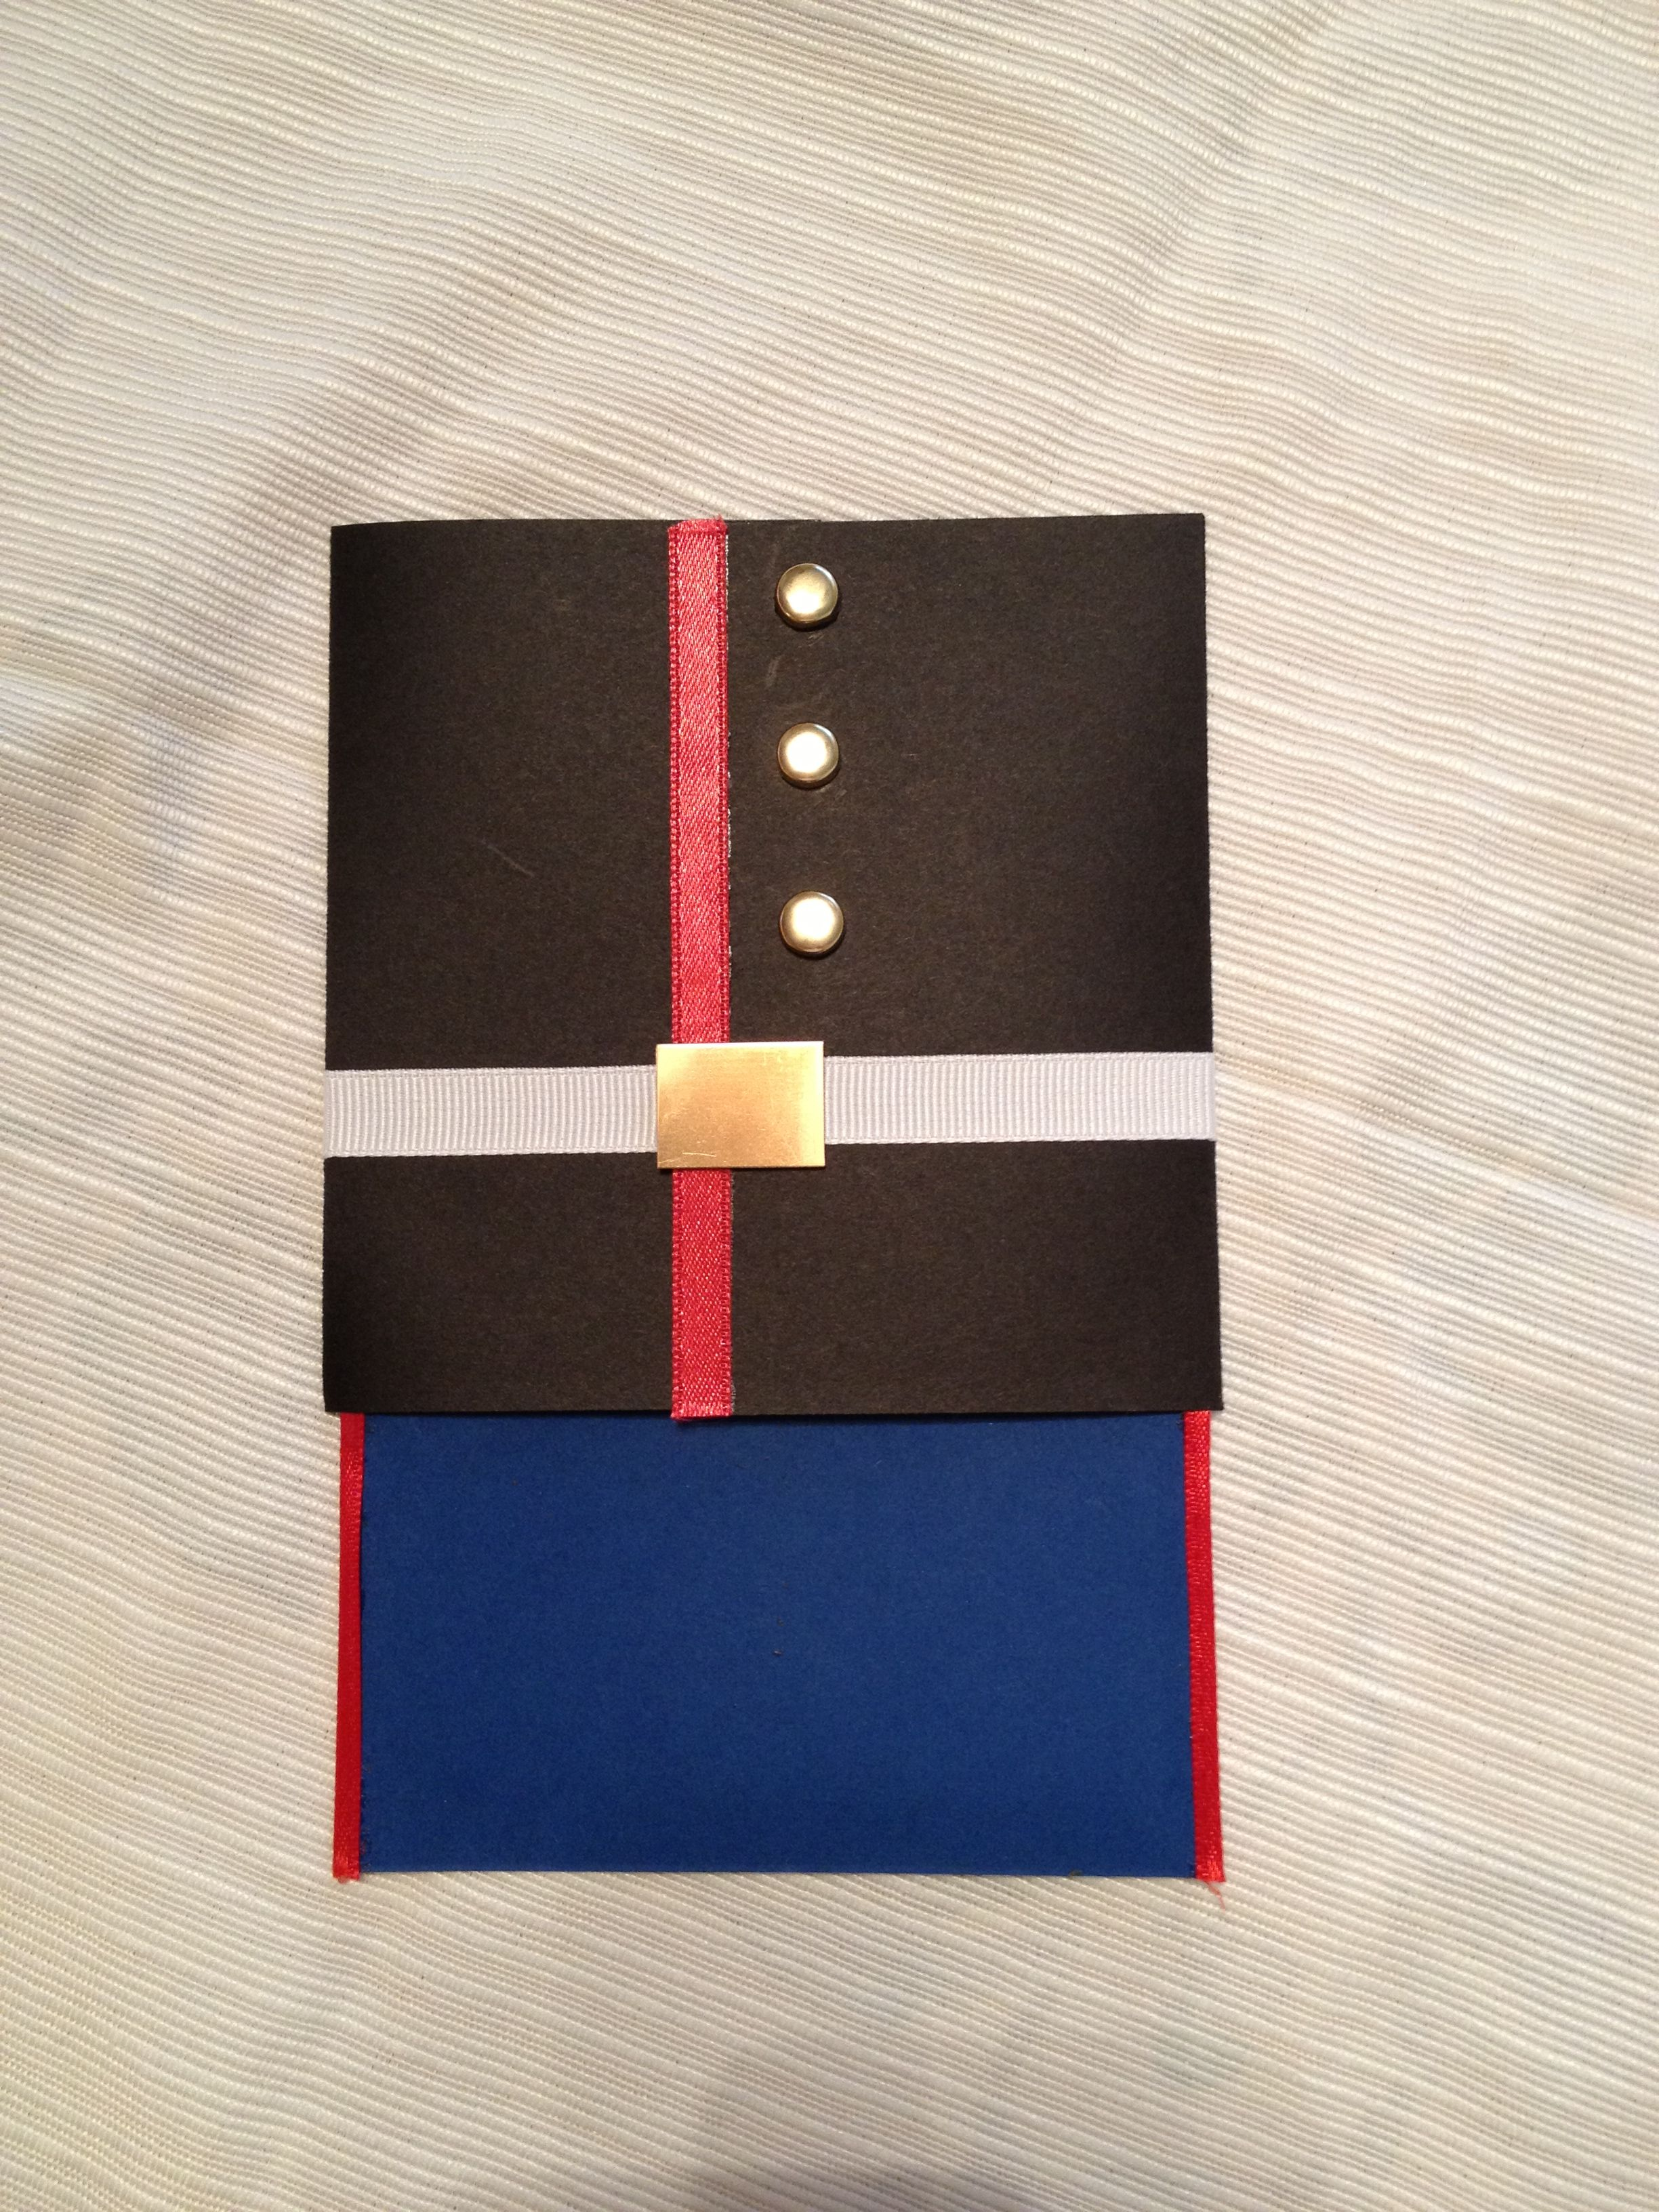 Marine Corp Invitation My style Pinterest Marines Marine